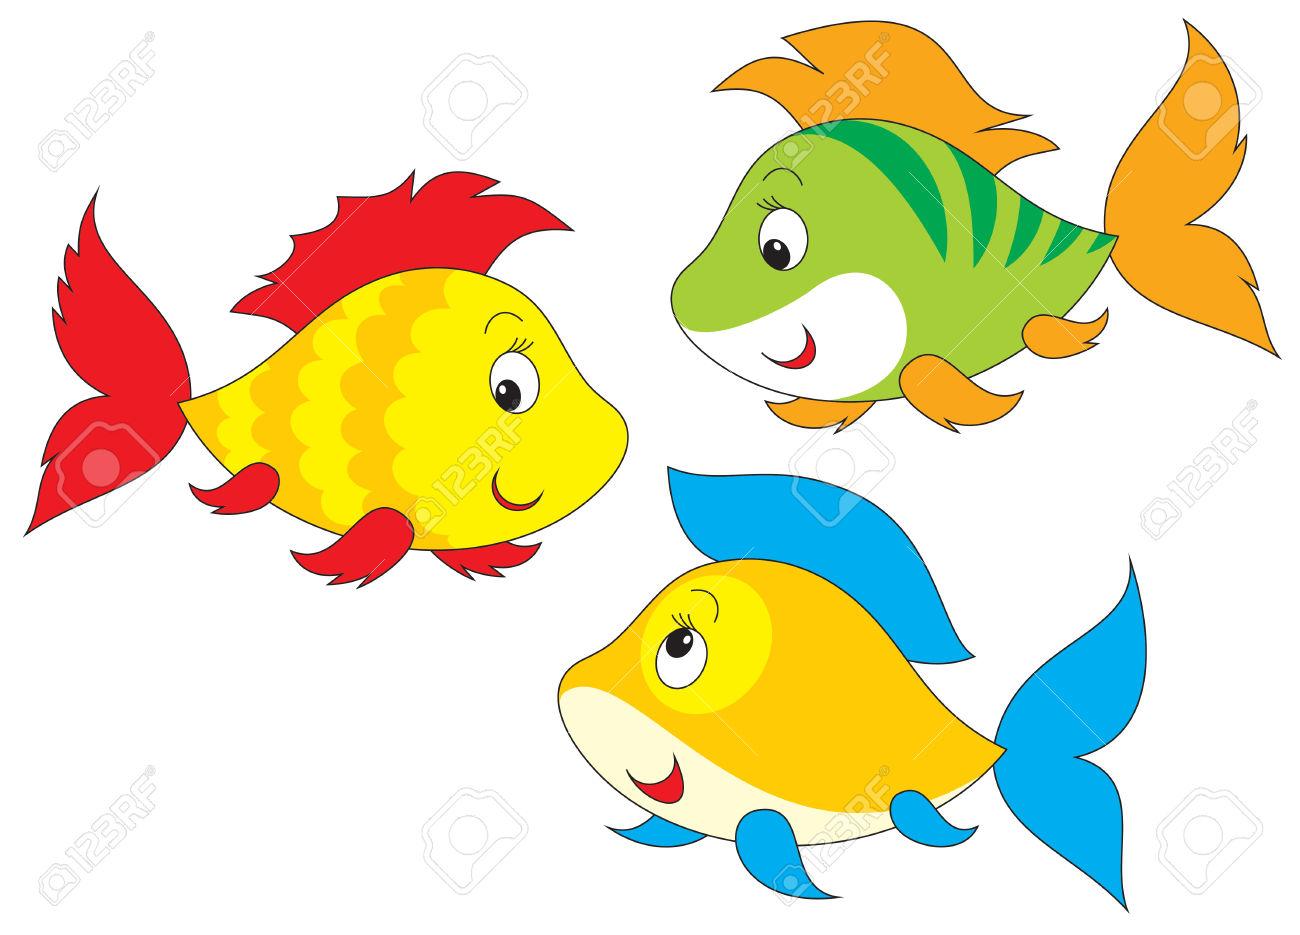 fish clipart-fish clipart-18